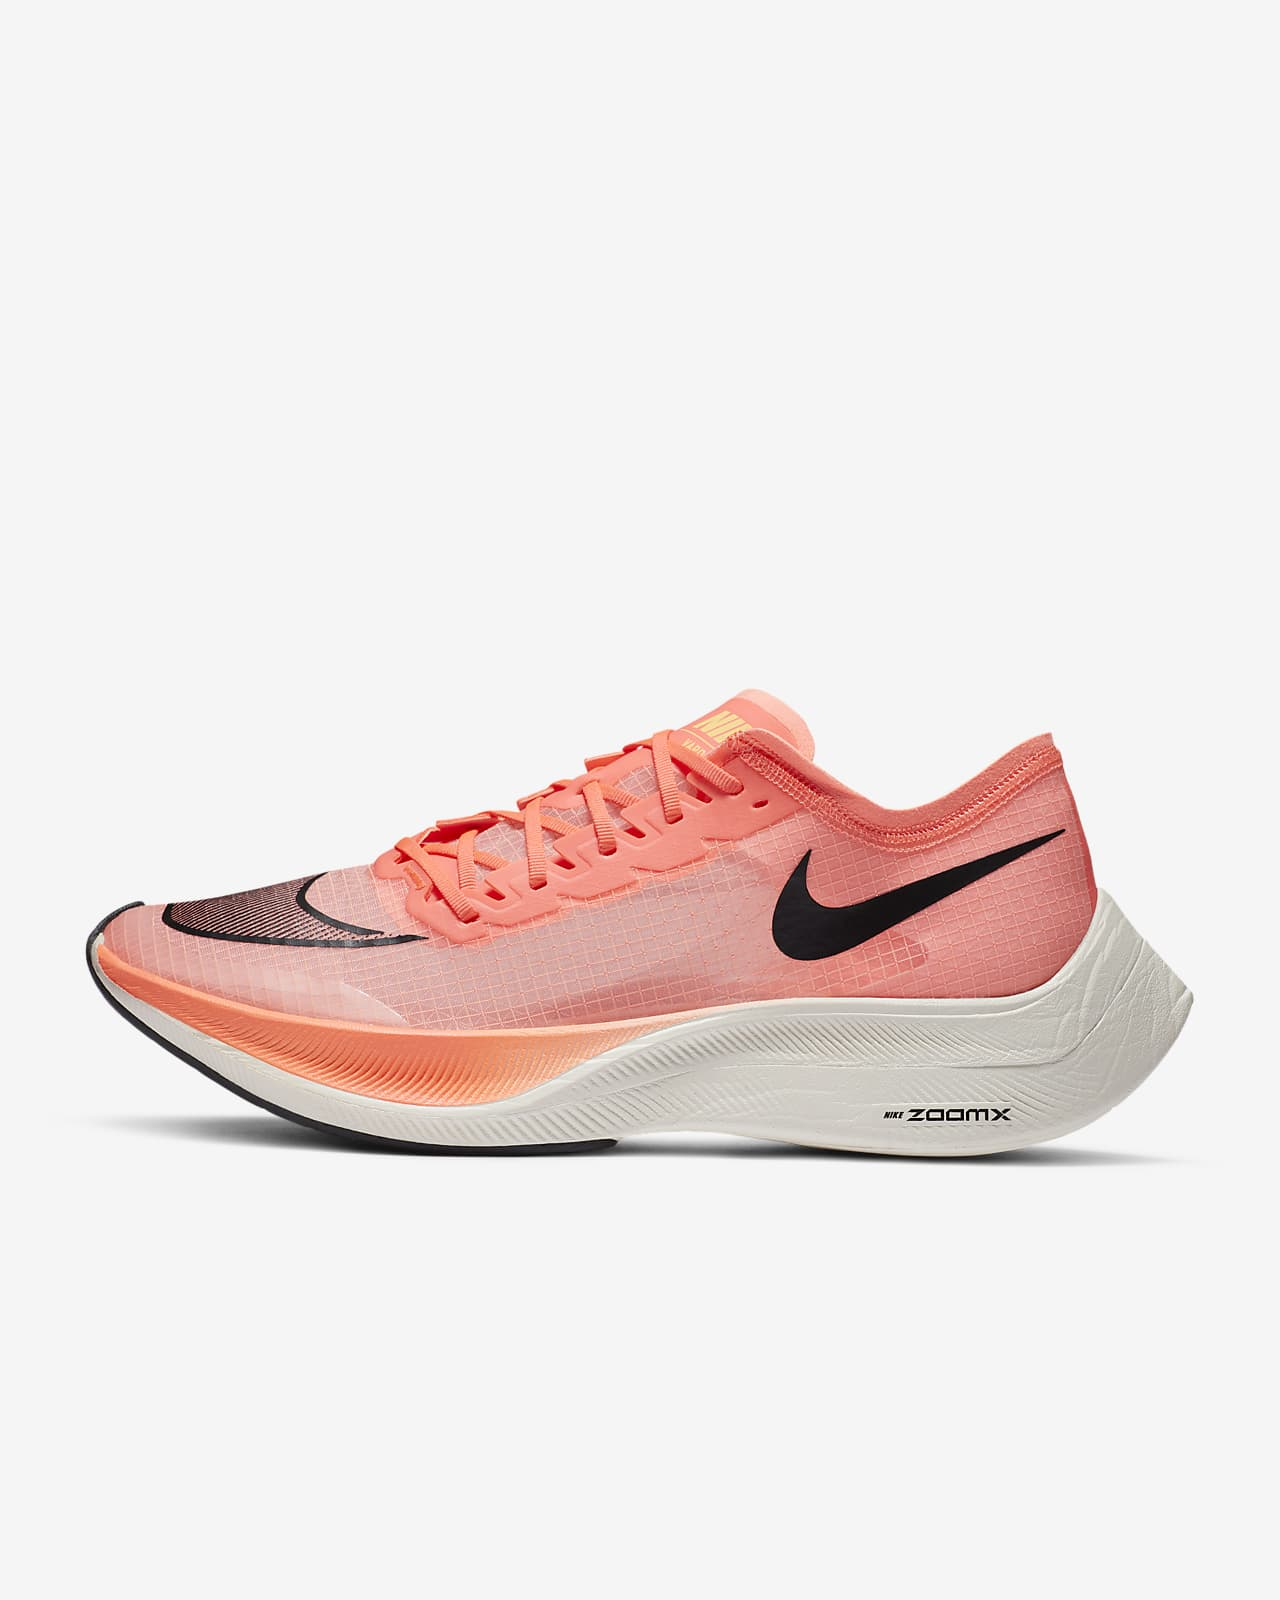 Nike Zoomx Vaporfly Next Hardloopschoen Nike Nl